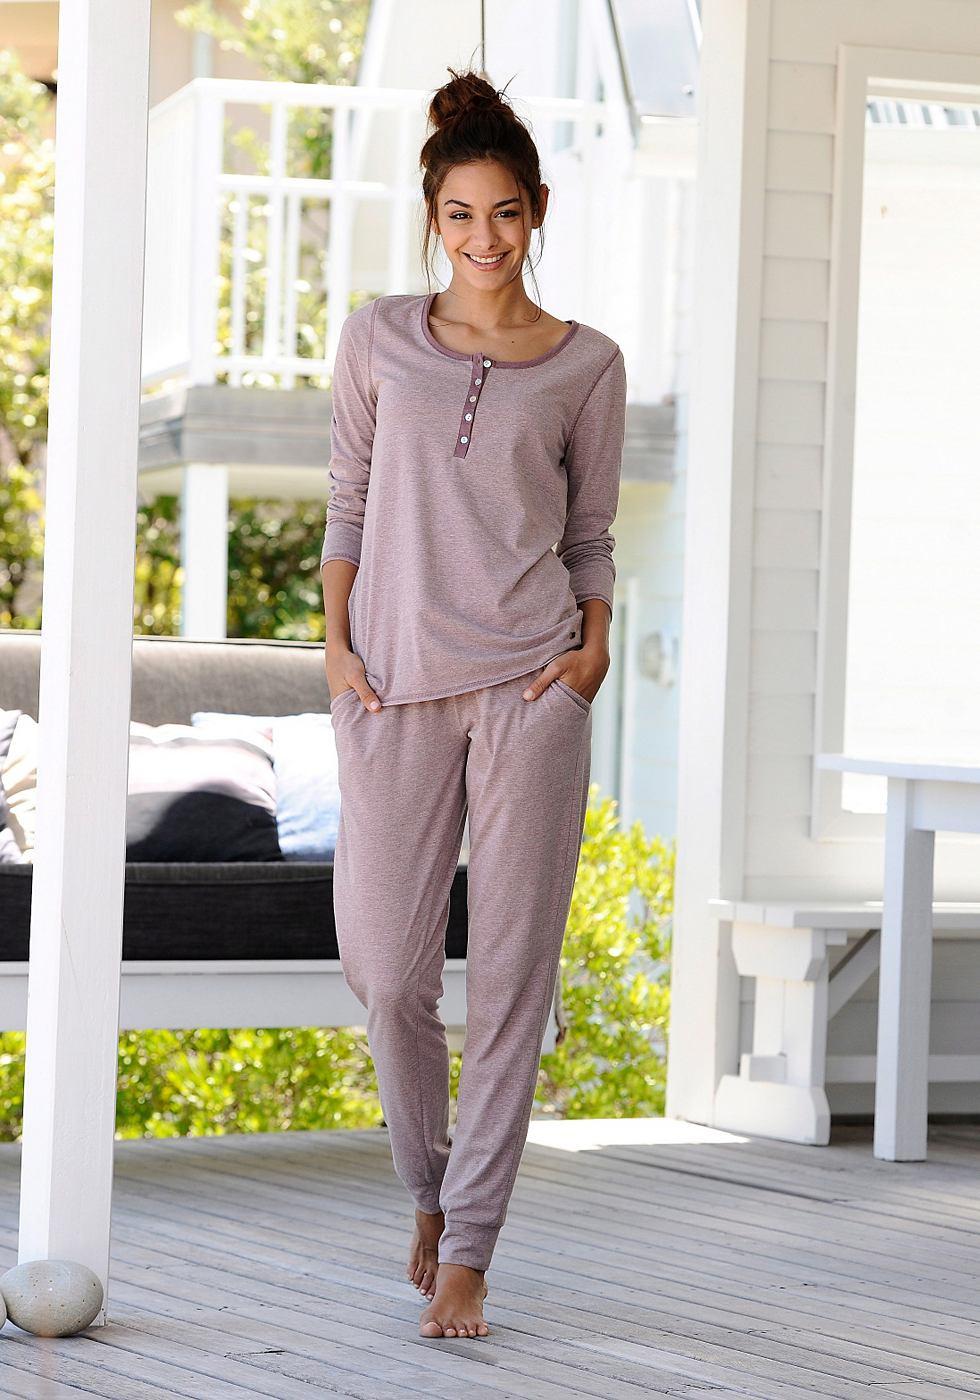 ARIZONA Pyjama in mêlee-look